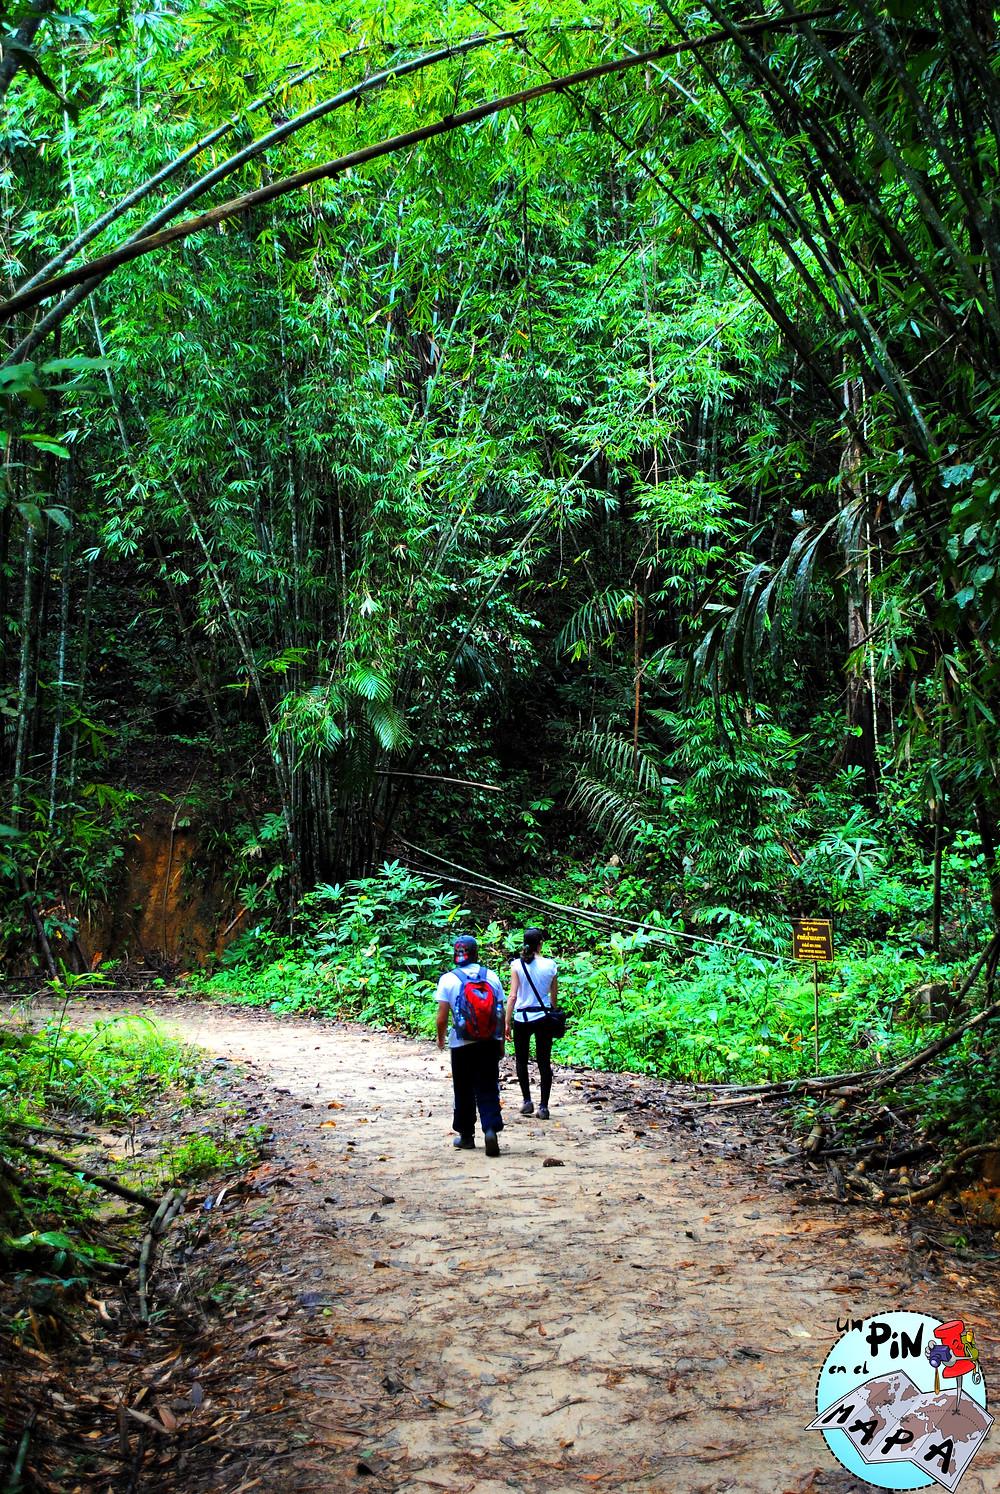 Parque Nacional Khao Sok | Un Pin en el Mapa